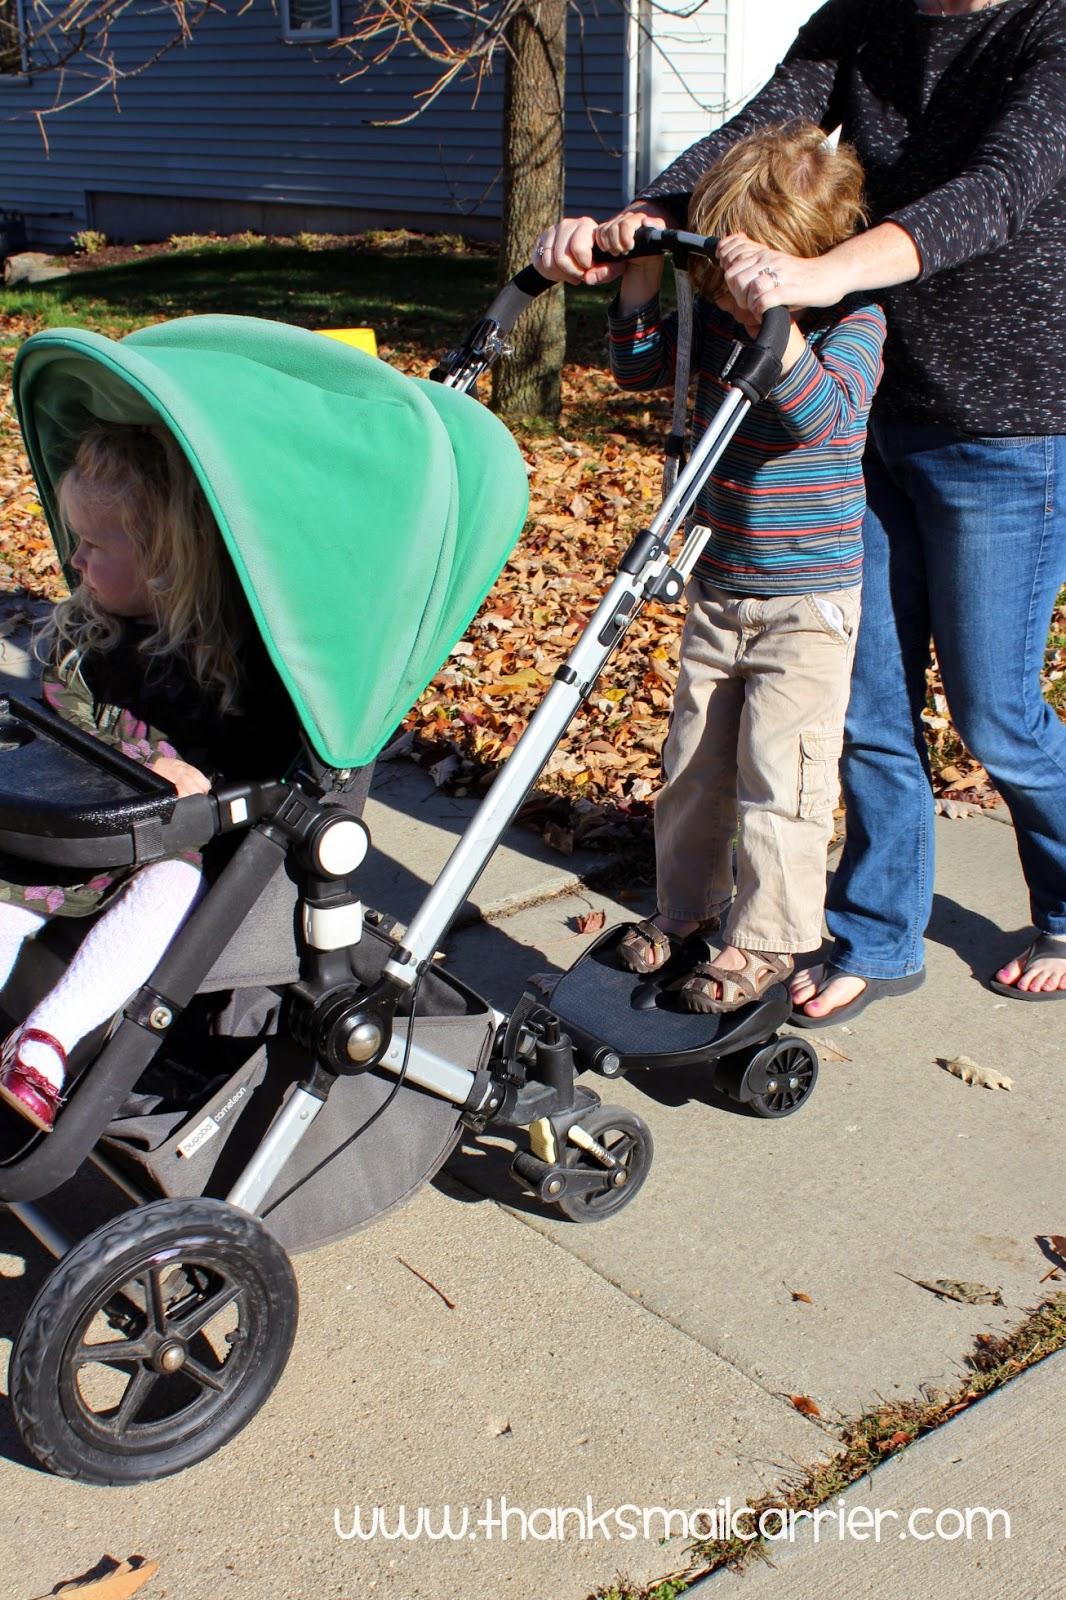 Joovy Bumprider stroller board